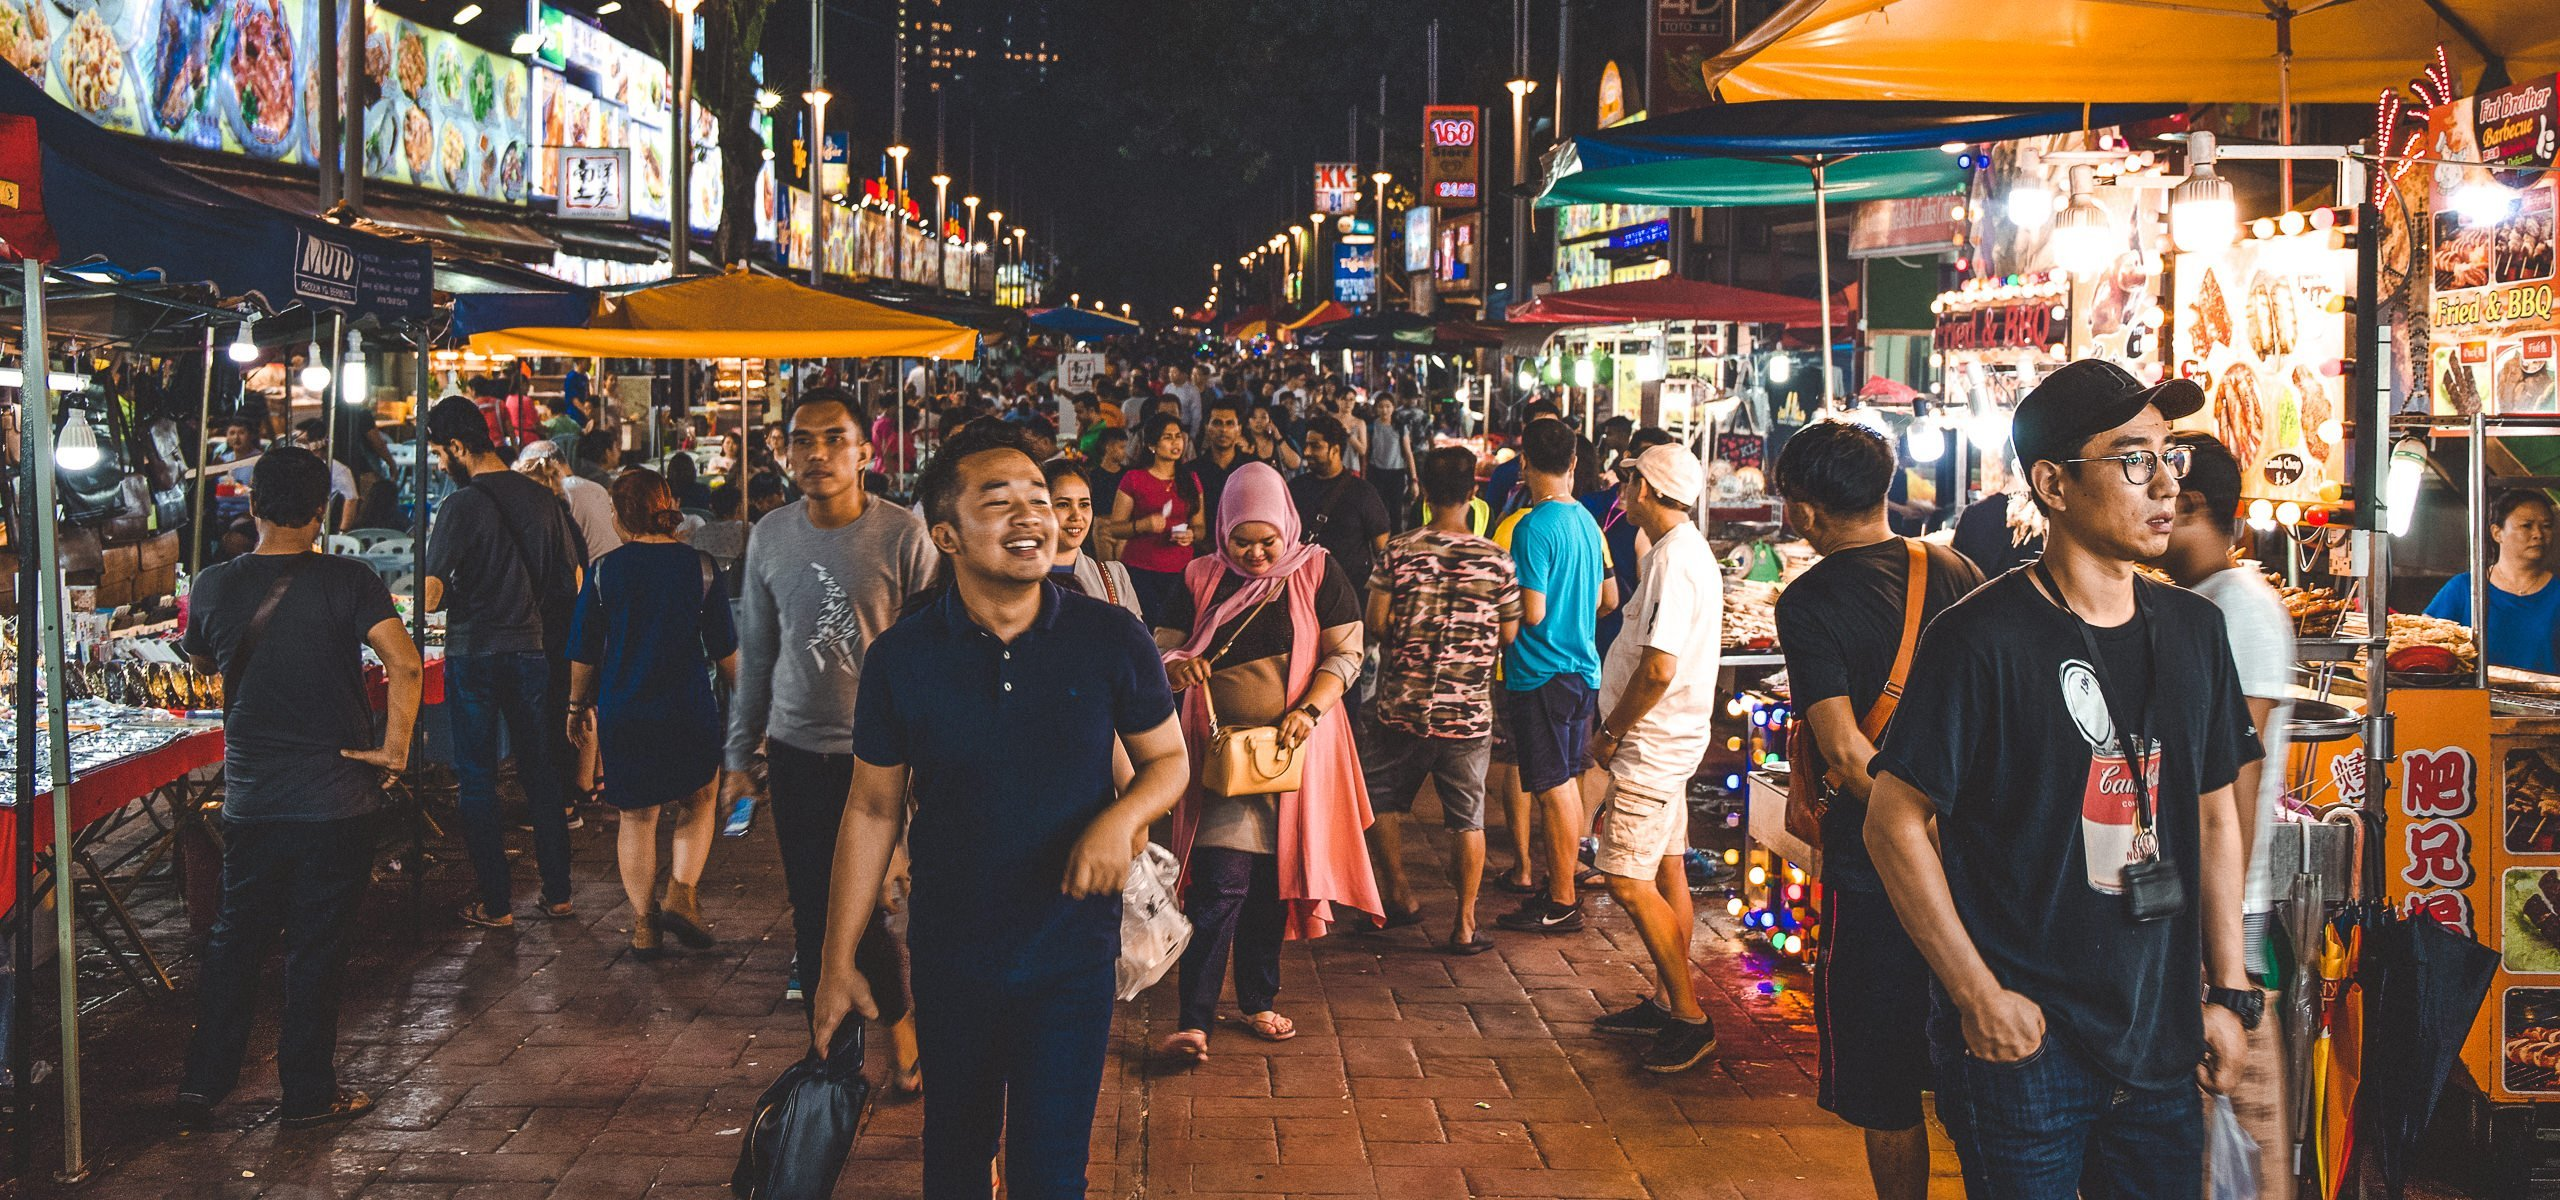 Crowds at Jalan Alor Street Food Night Market